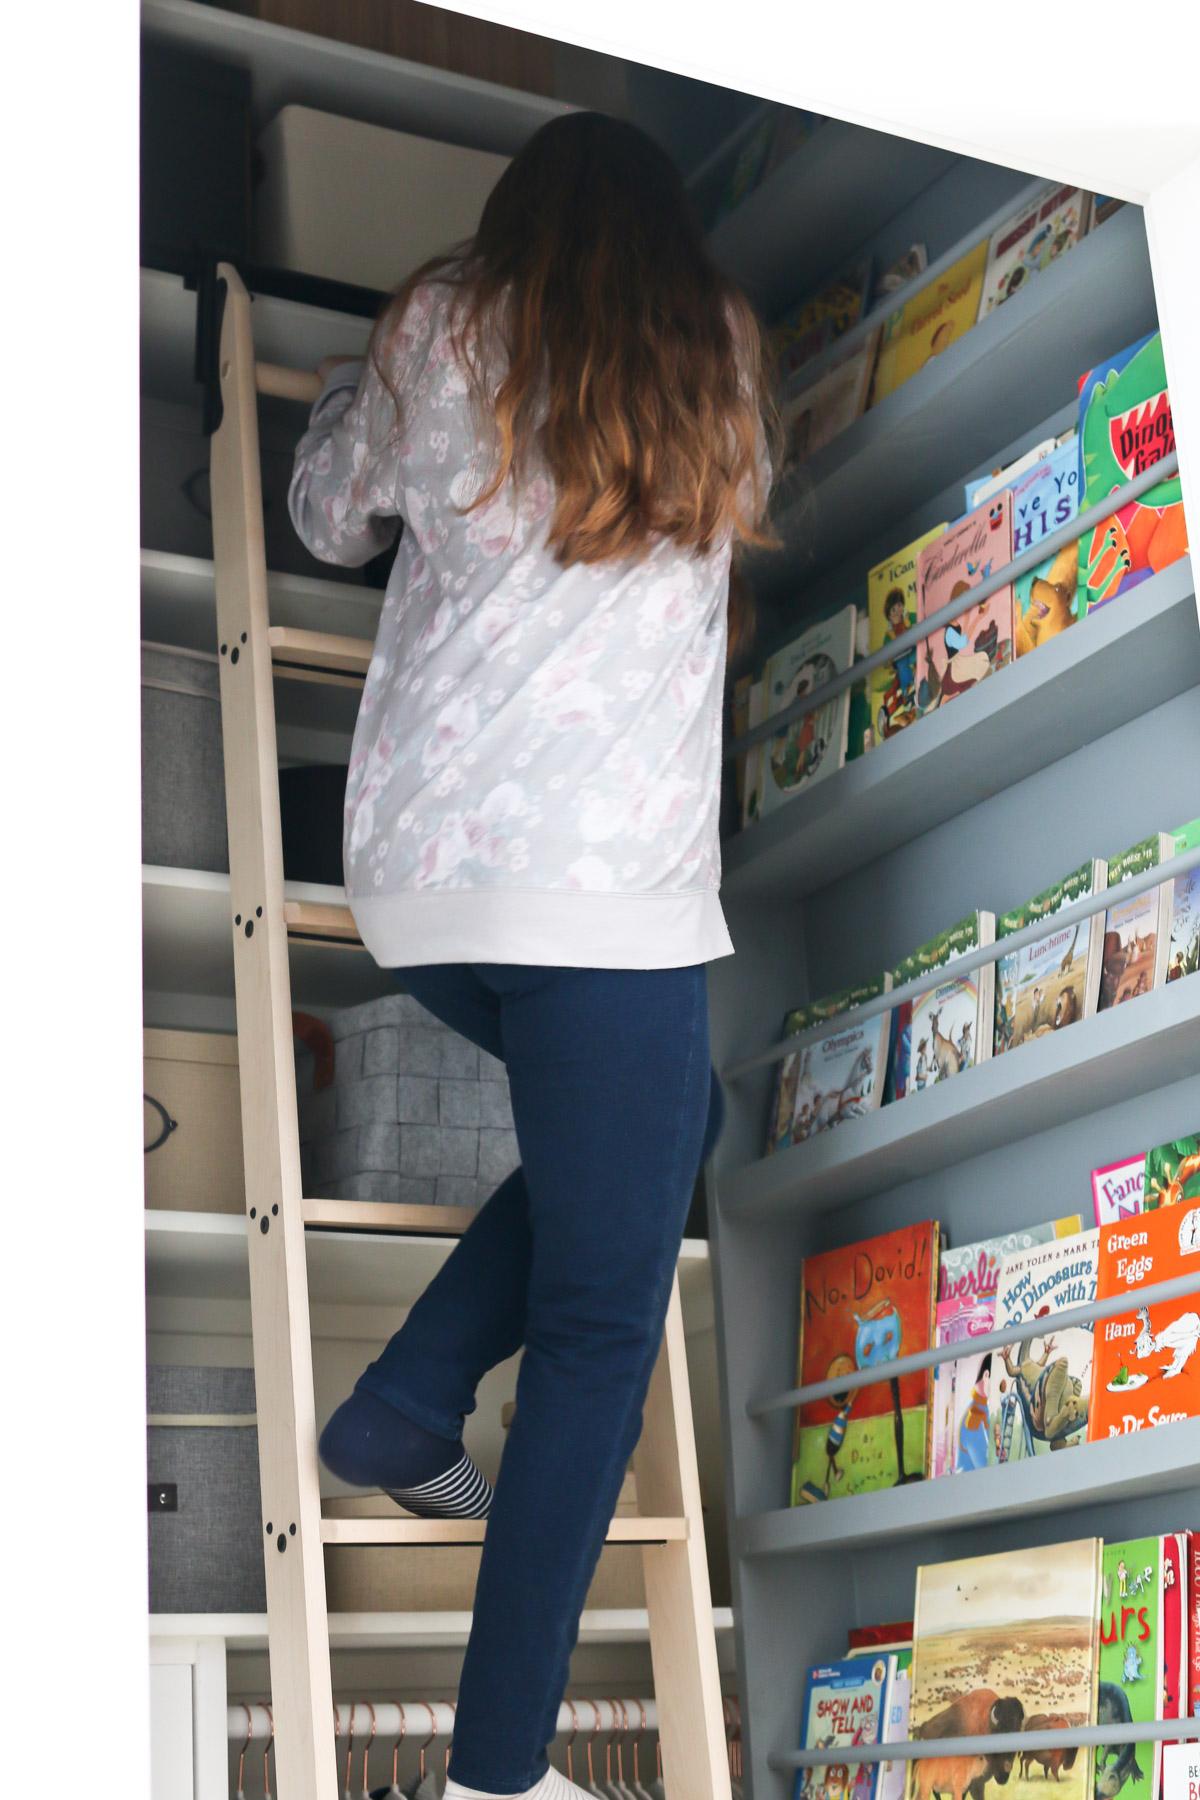 young girl climbing a ladder to reach a book